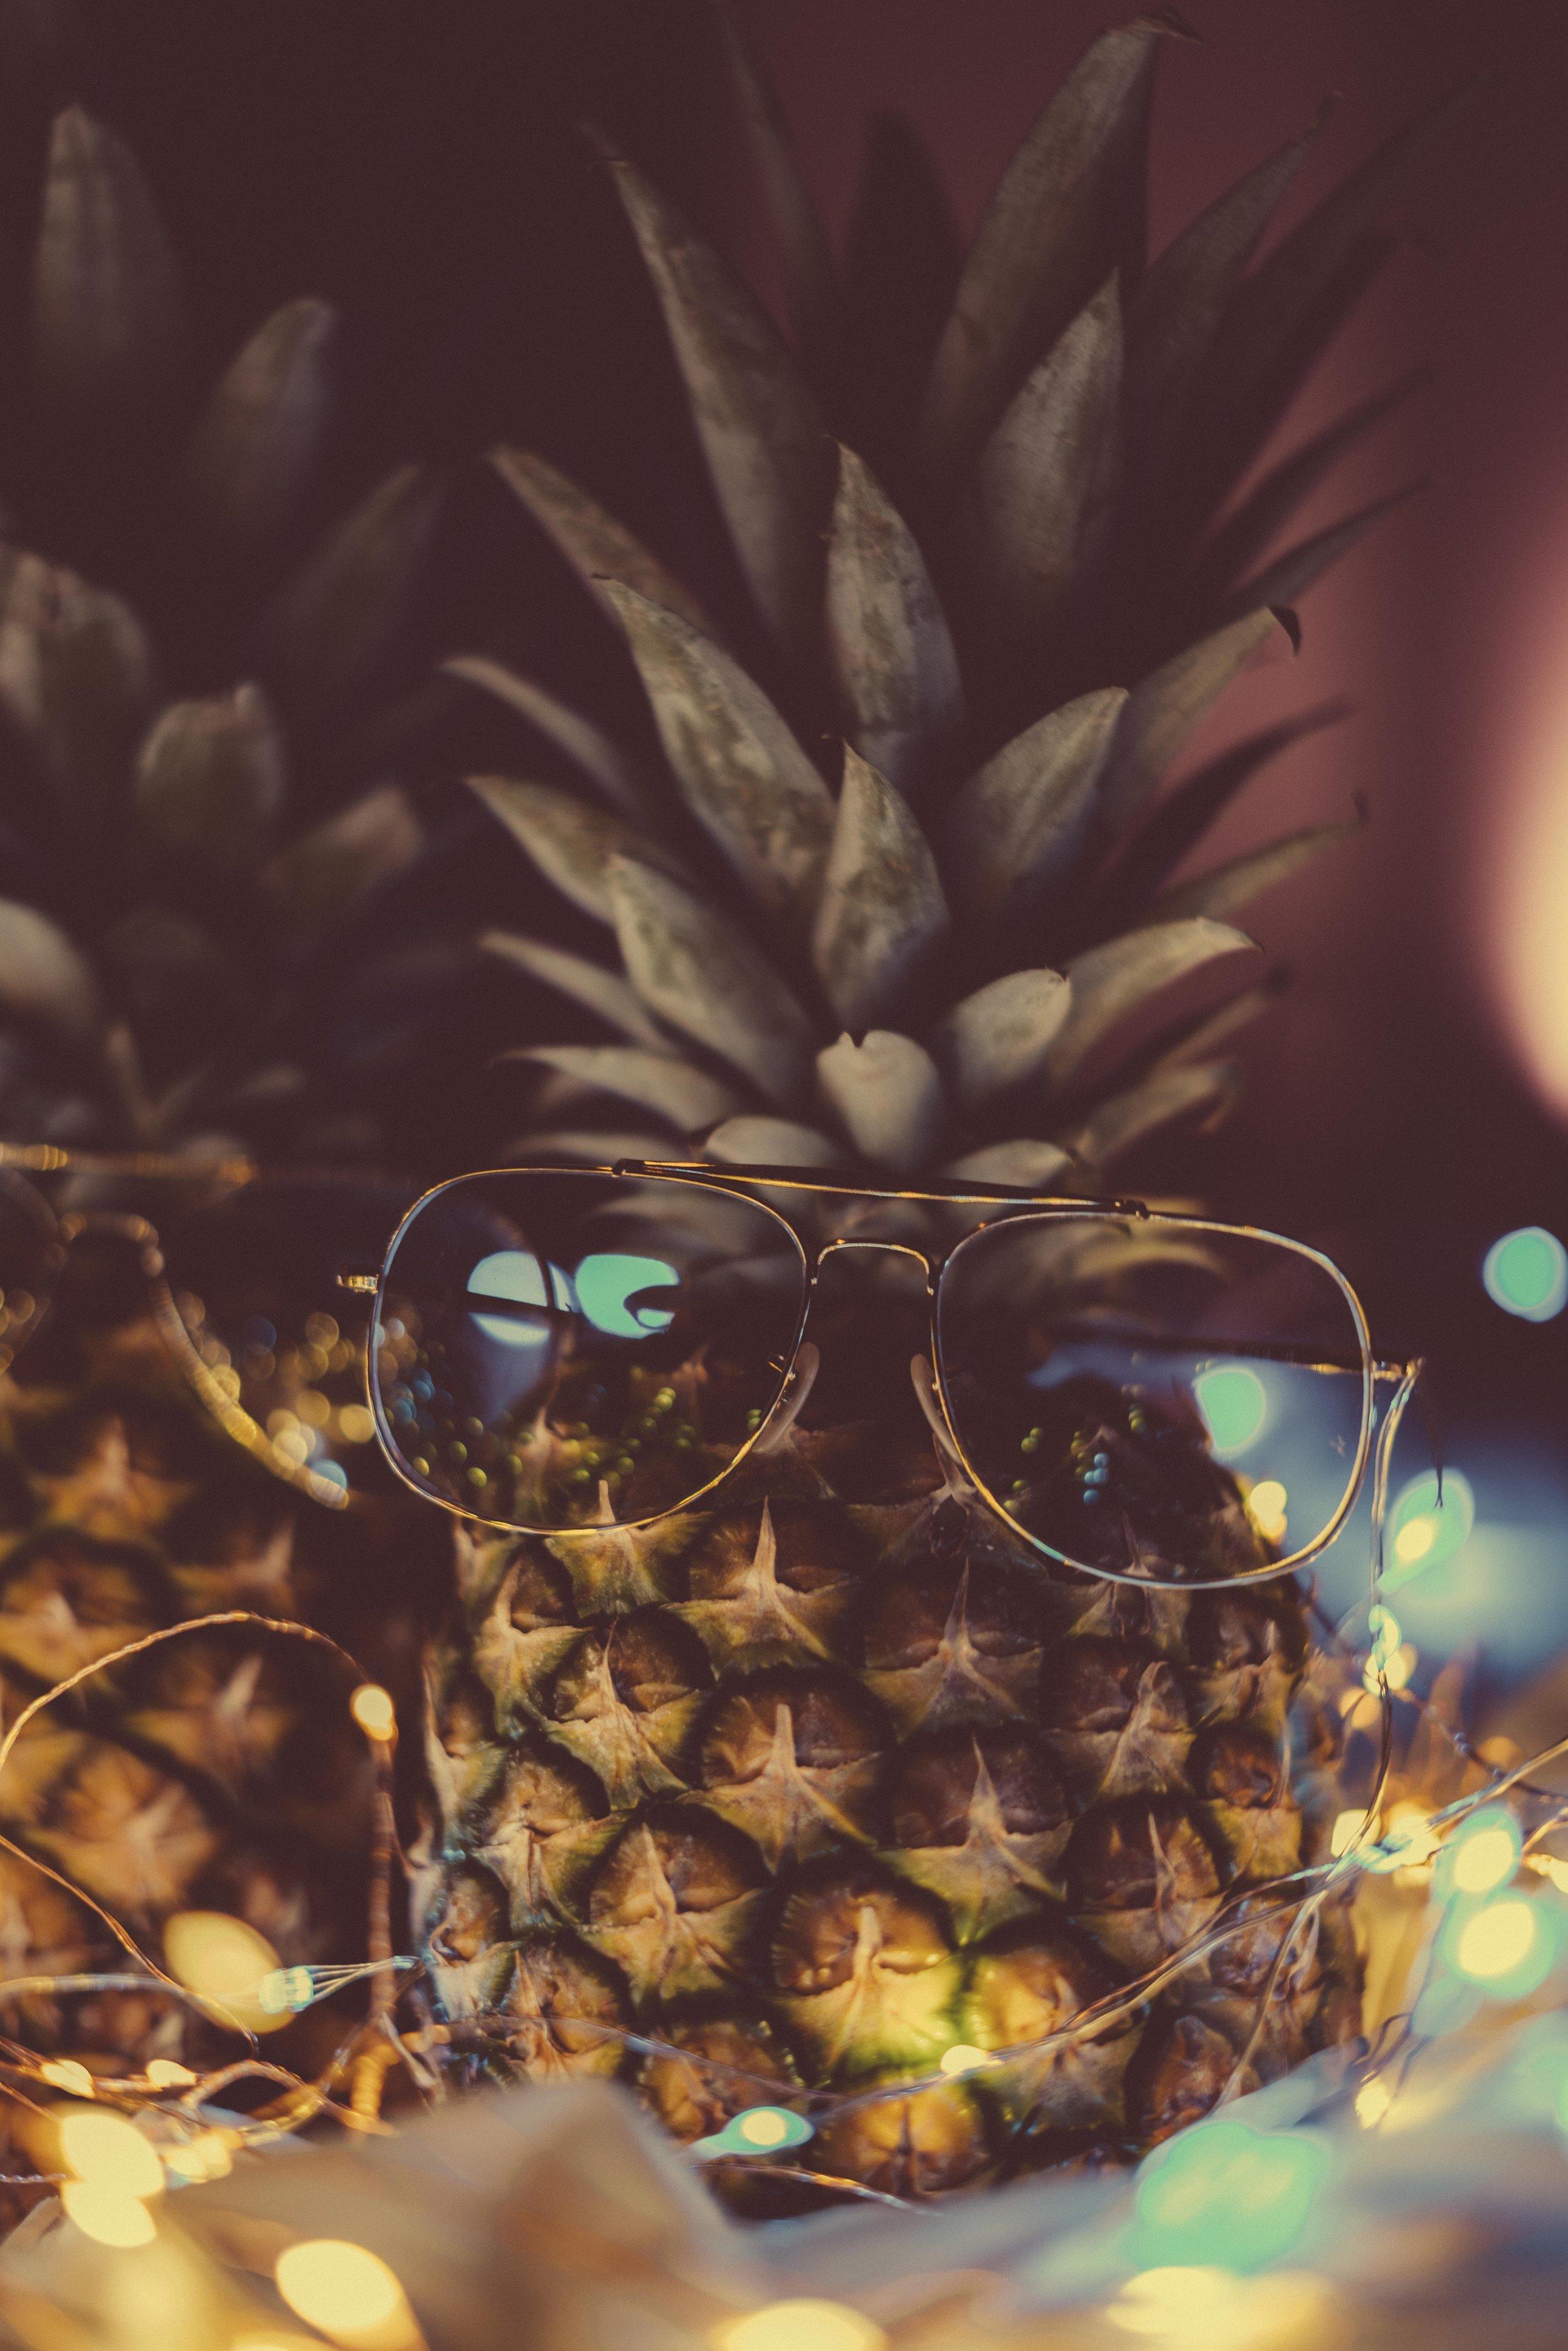 pineapple-supply-co-660559-unsplash.jpg